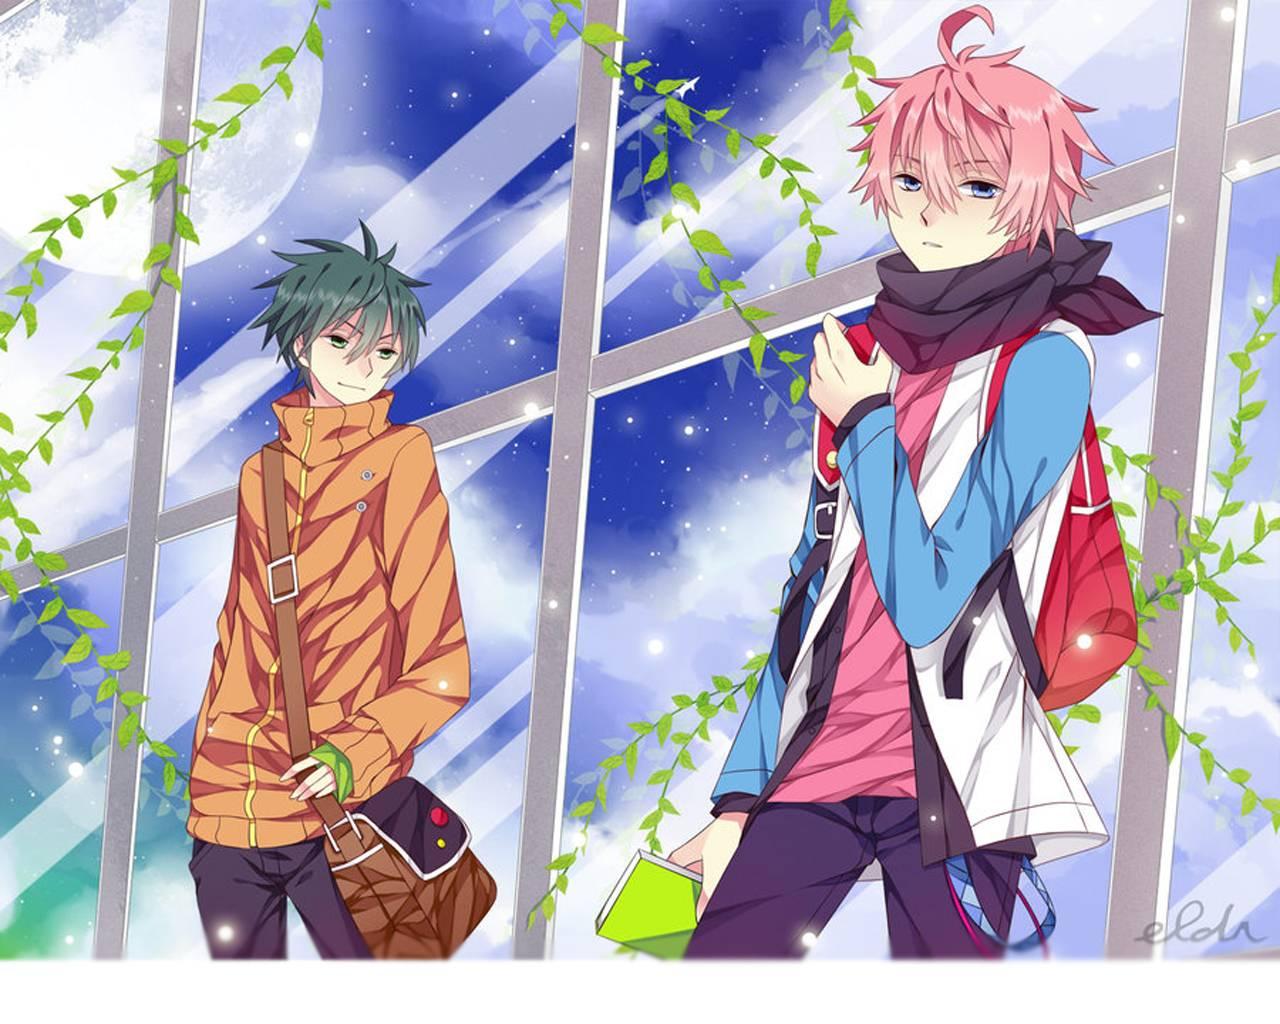 Cute Anime Boy Wallpaper - WallpaperSafari